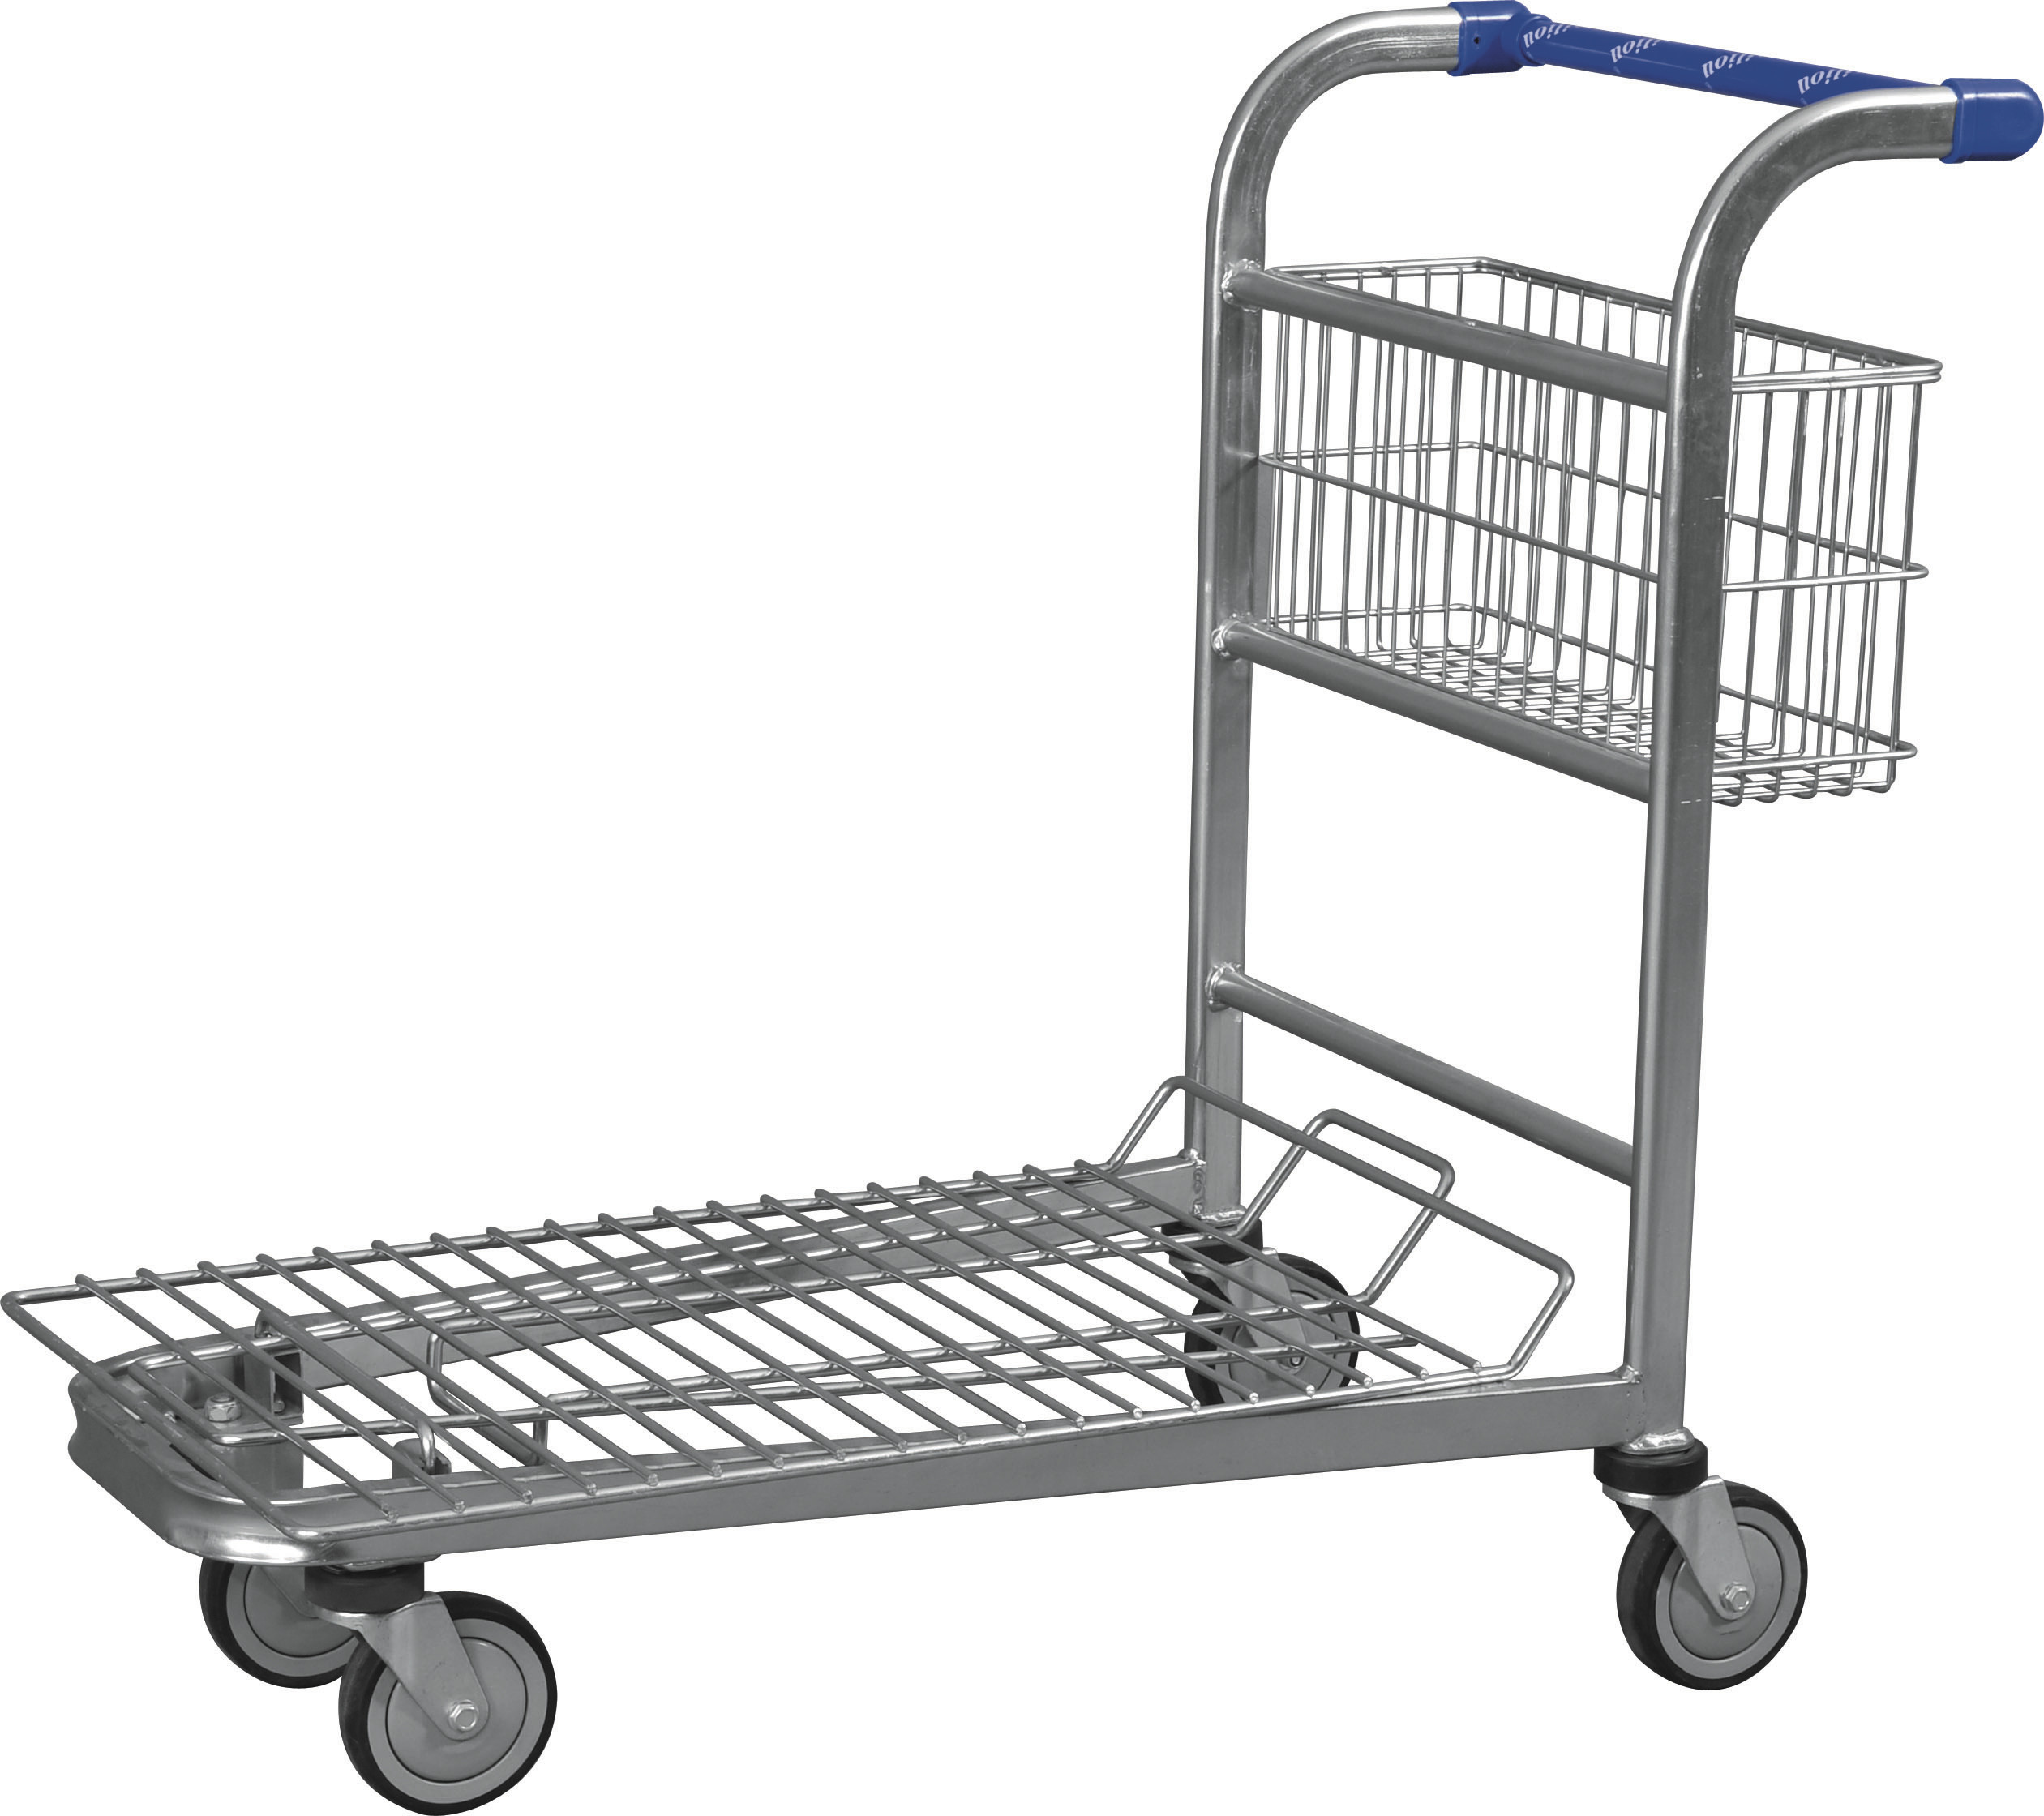 Wire Metal Warehouse Trolleys With 4 Swivel 5 Inch Wheels